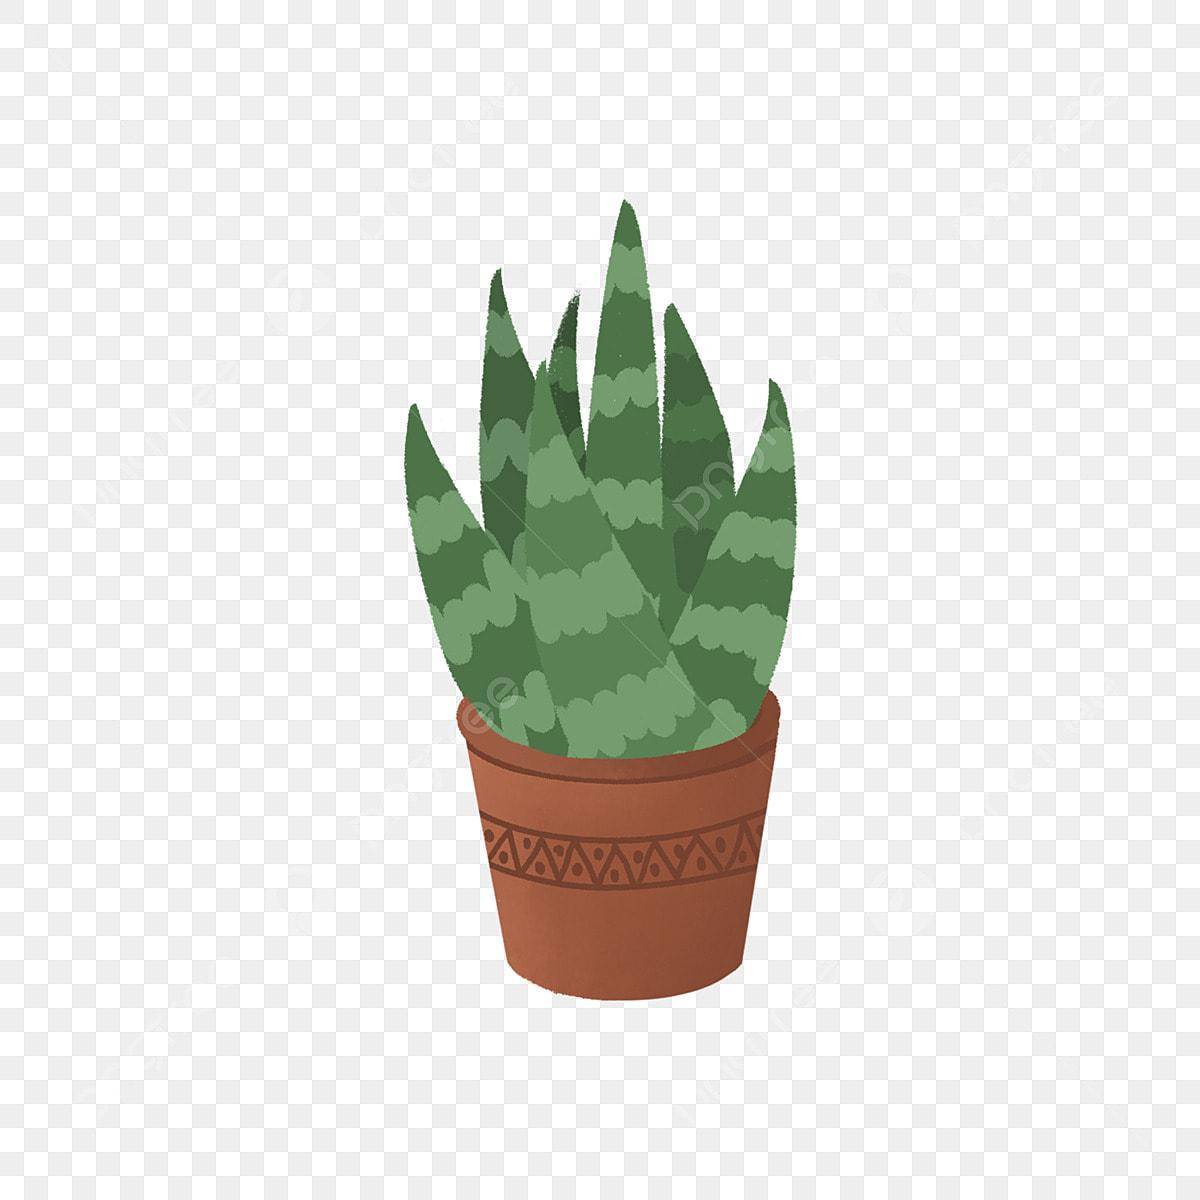 Dessin Animé D Aloe Vera Aloe Vera Plantes En Pot Plantes